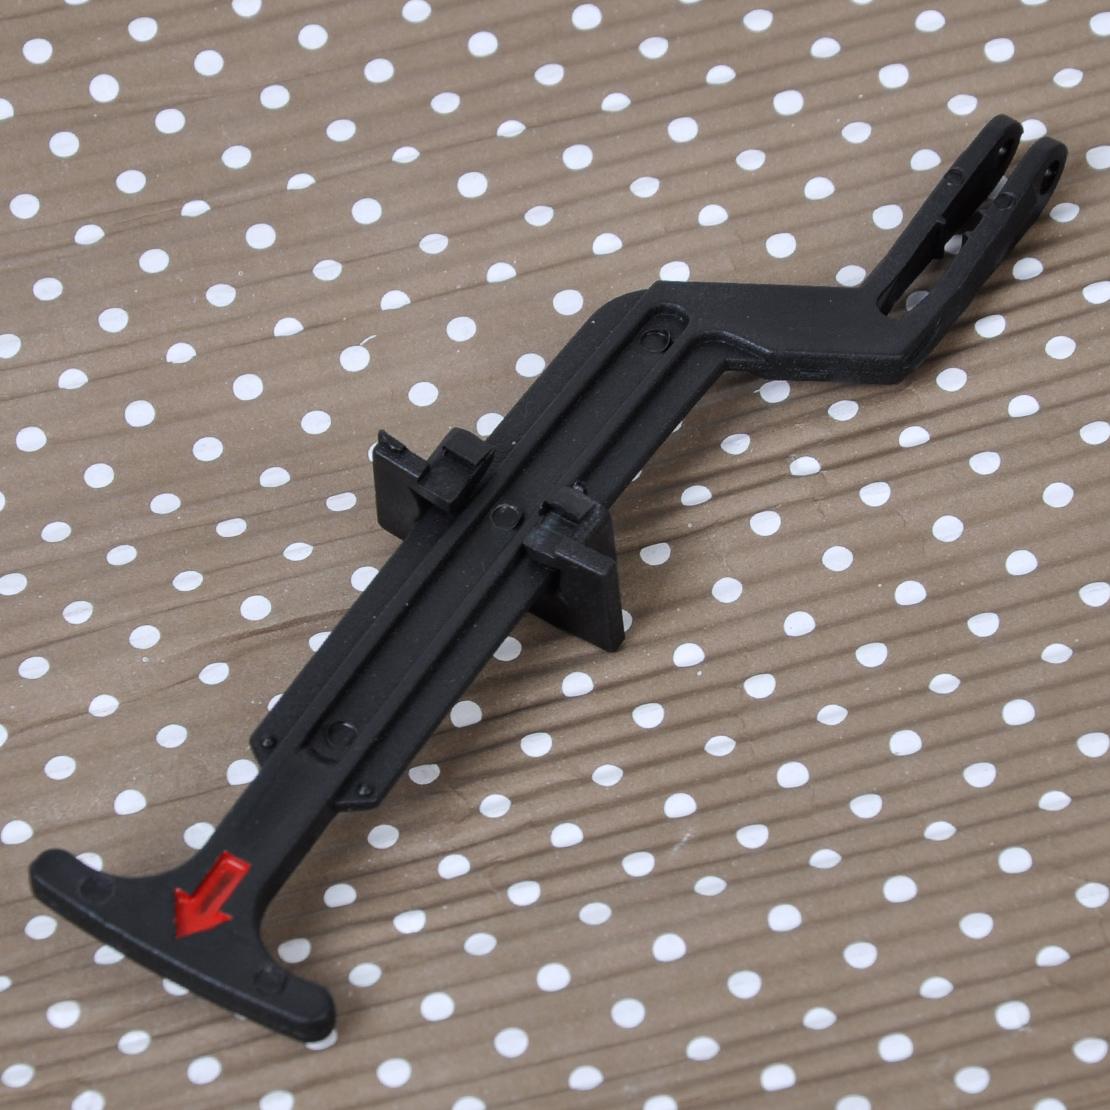 New Bonnet Hood Release Rod Lock Latch Handle for VW 98-04 Passat 3B0823593